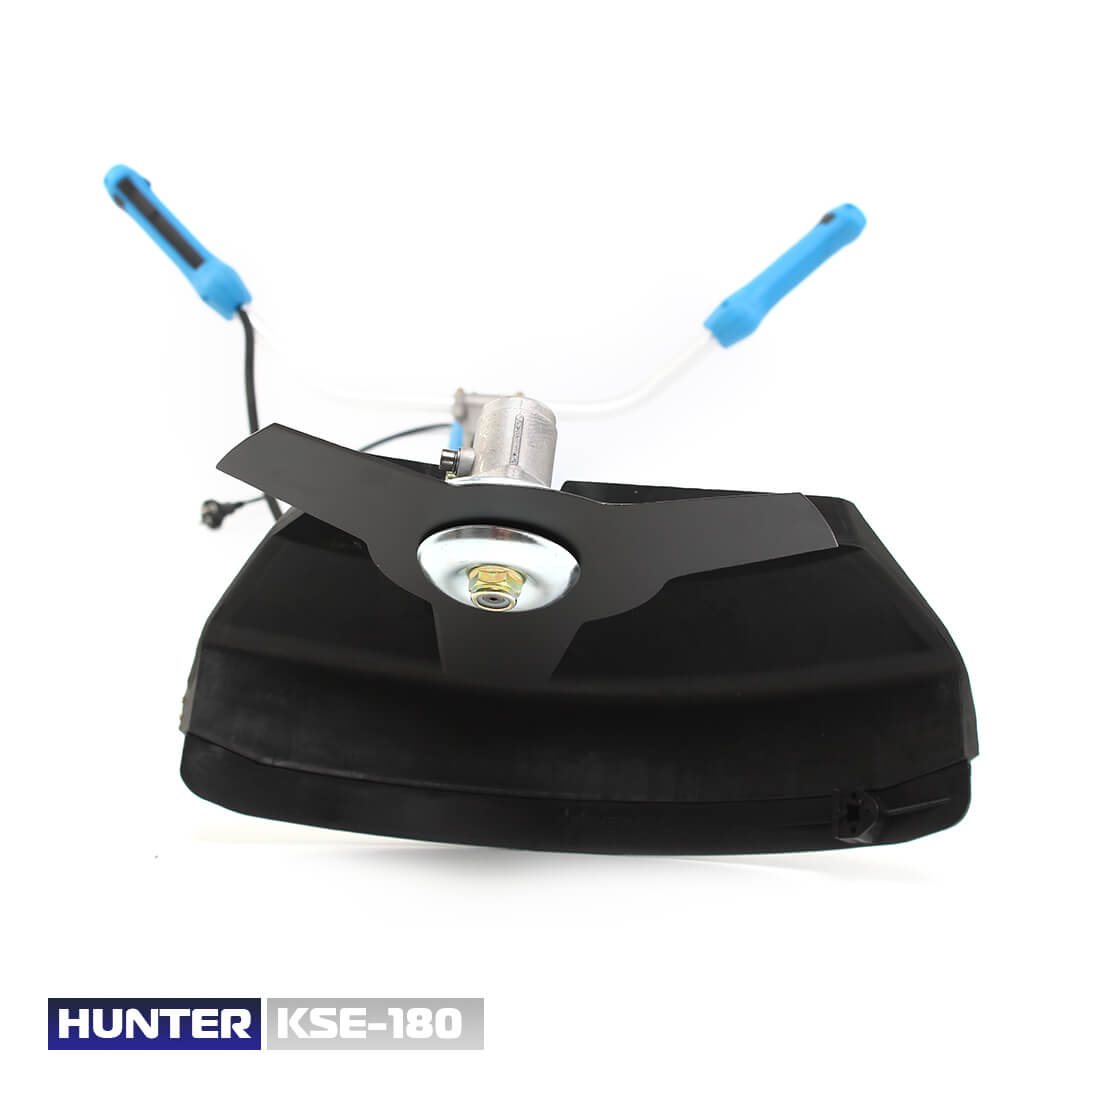 Фото Электрический триммер KSE-180 цена 2300грн №4 — Hunter